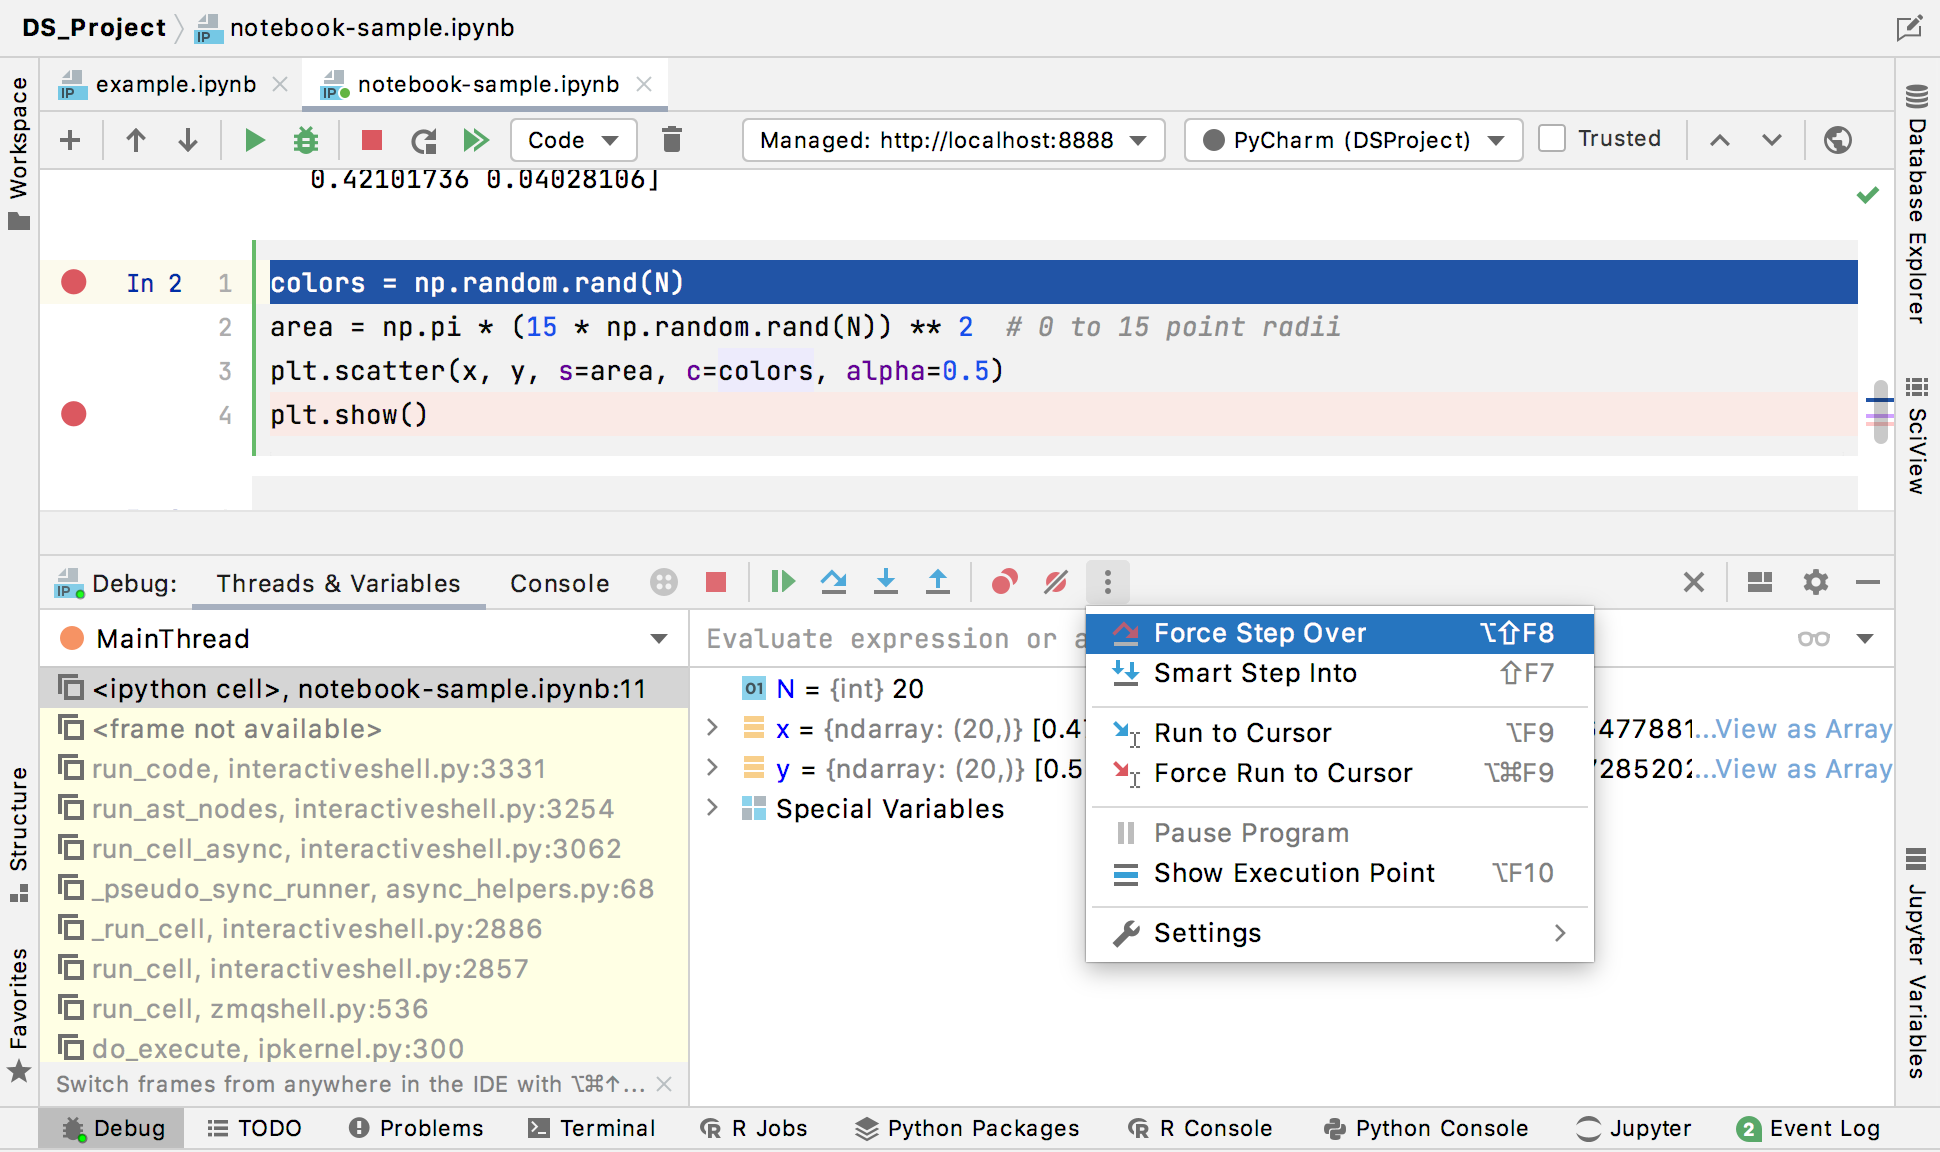 Jupyter Notebook Debugger tool window